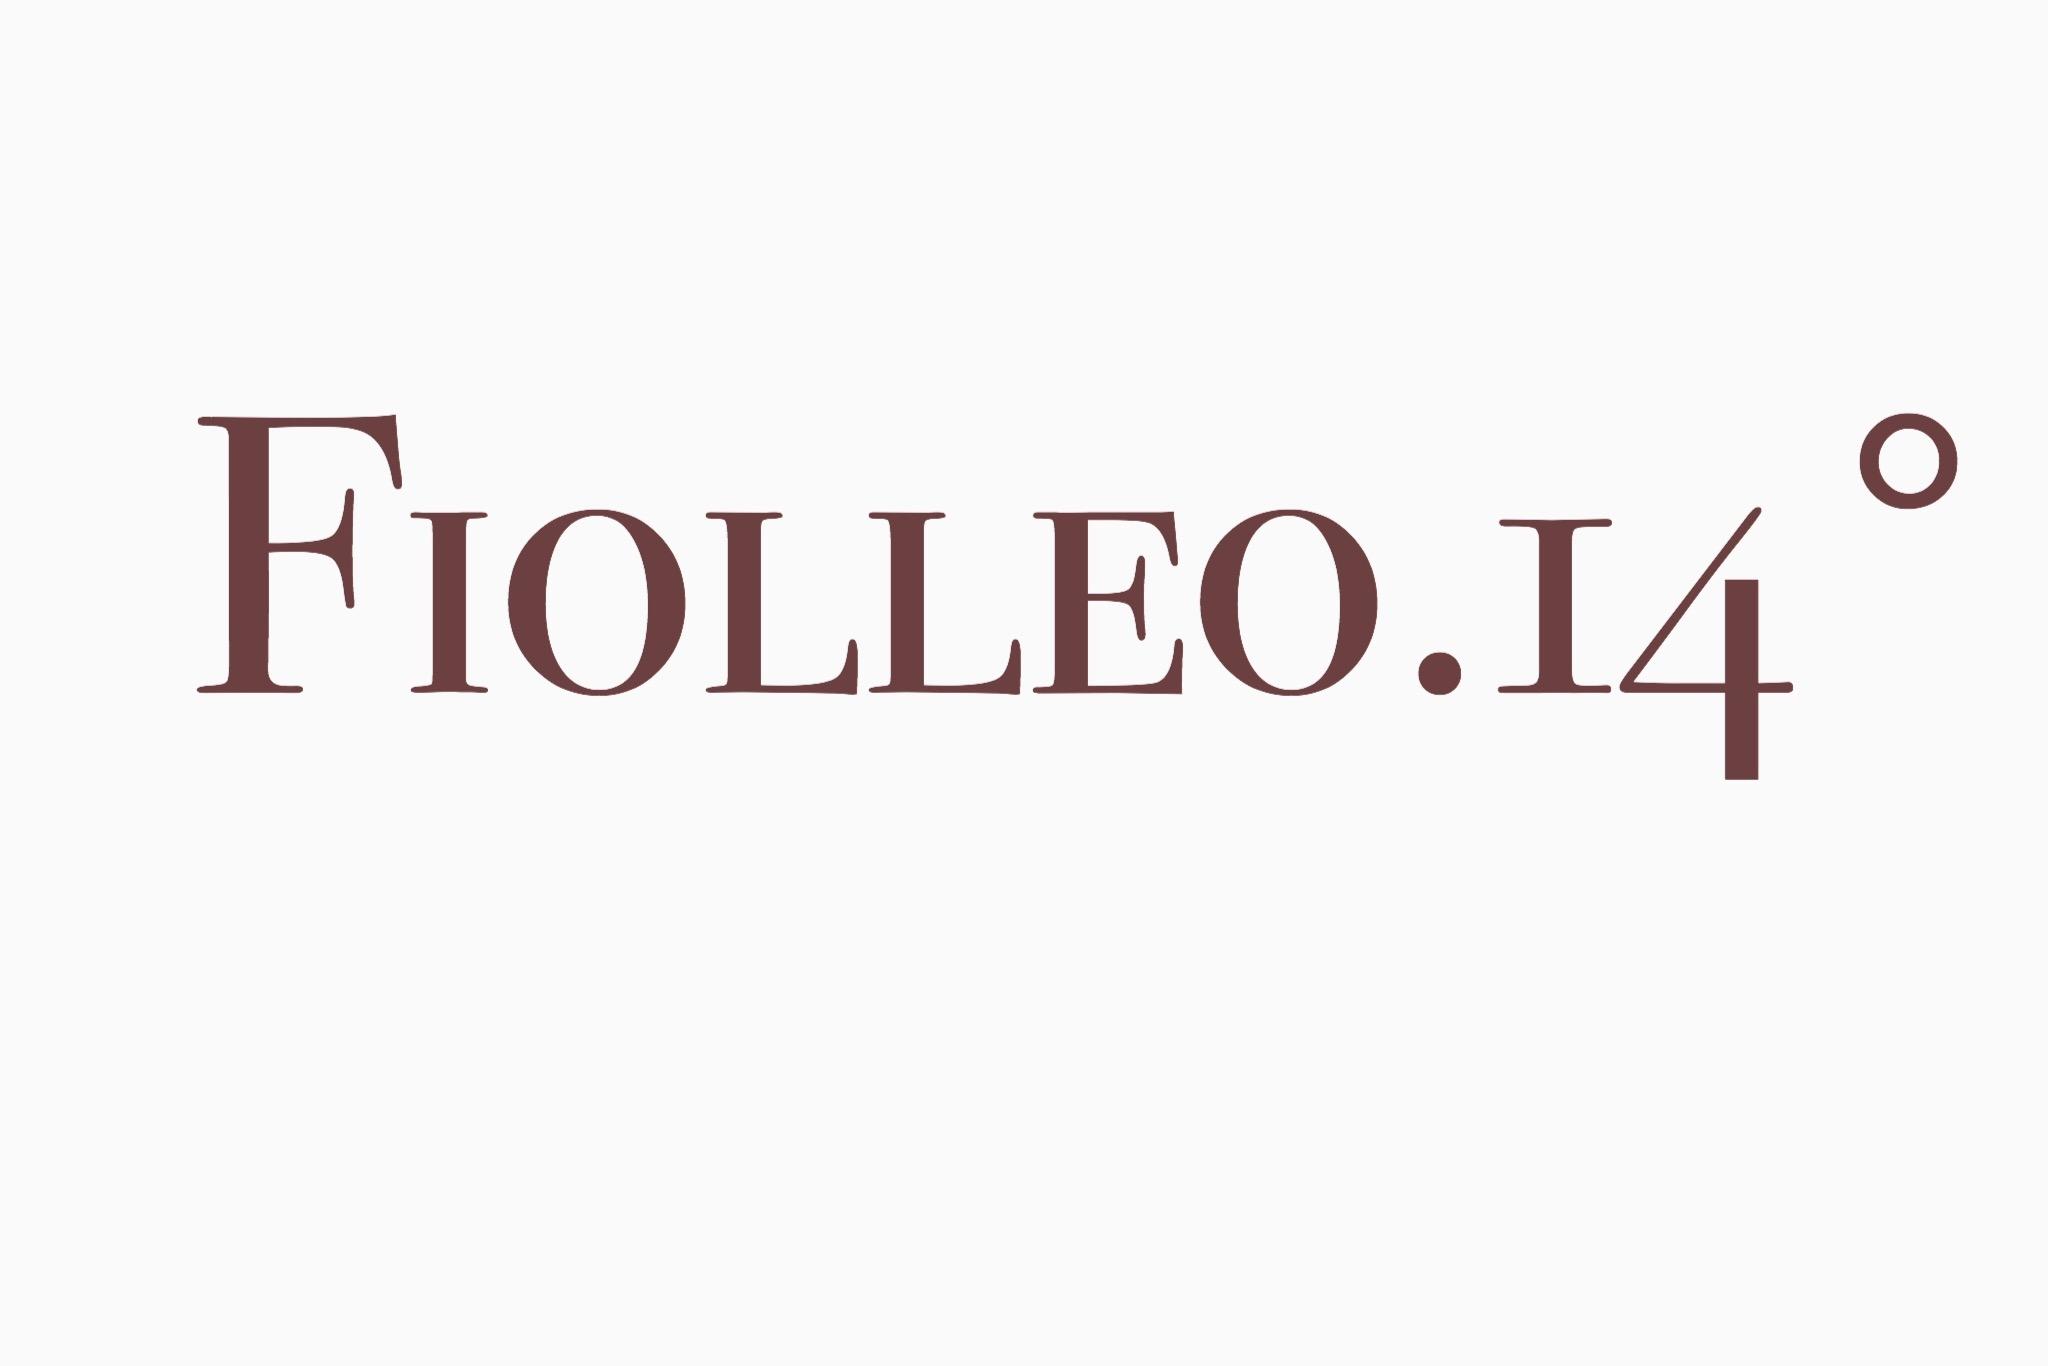 Fiolleo_14°